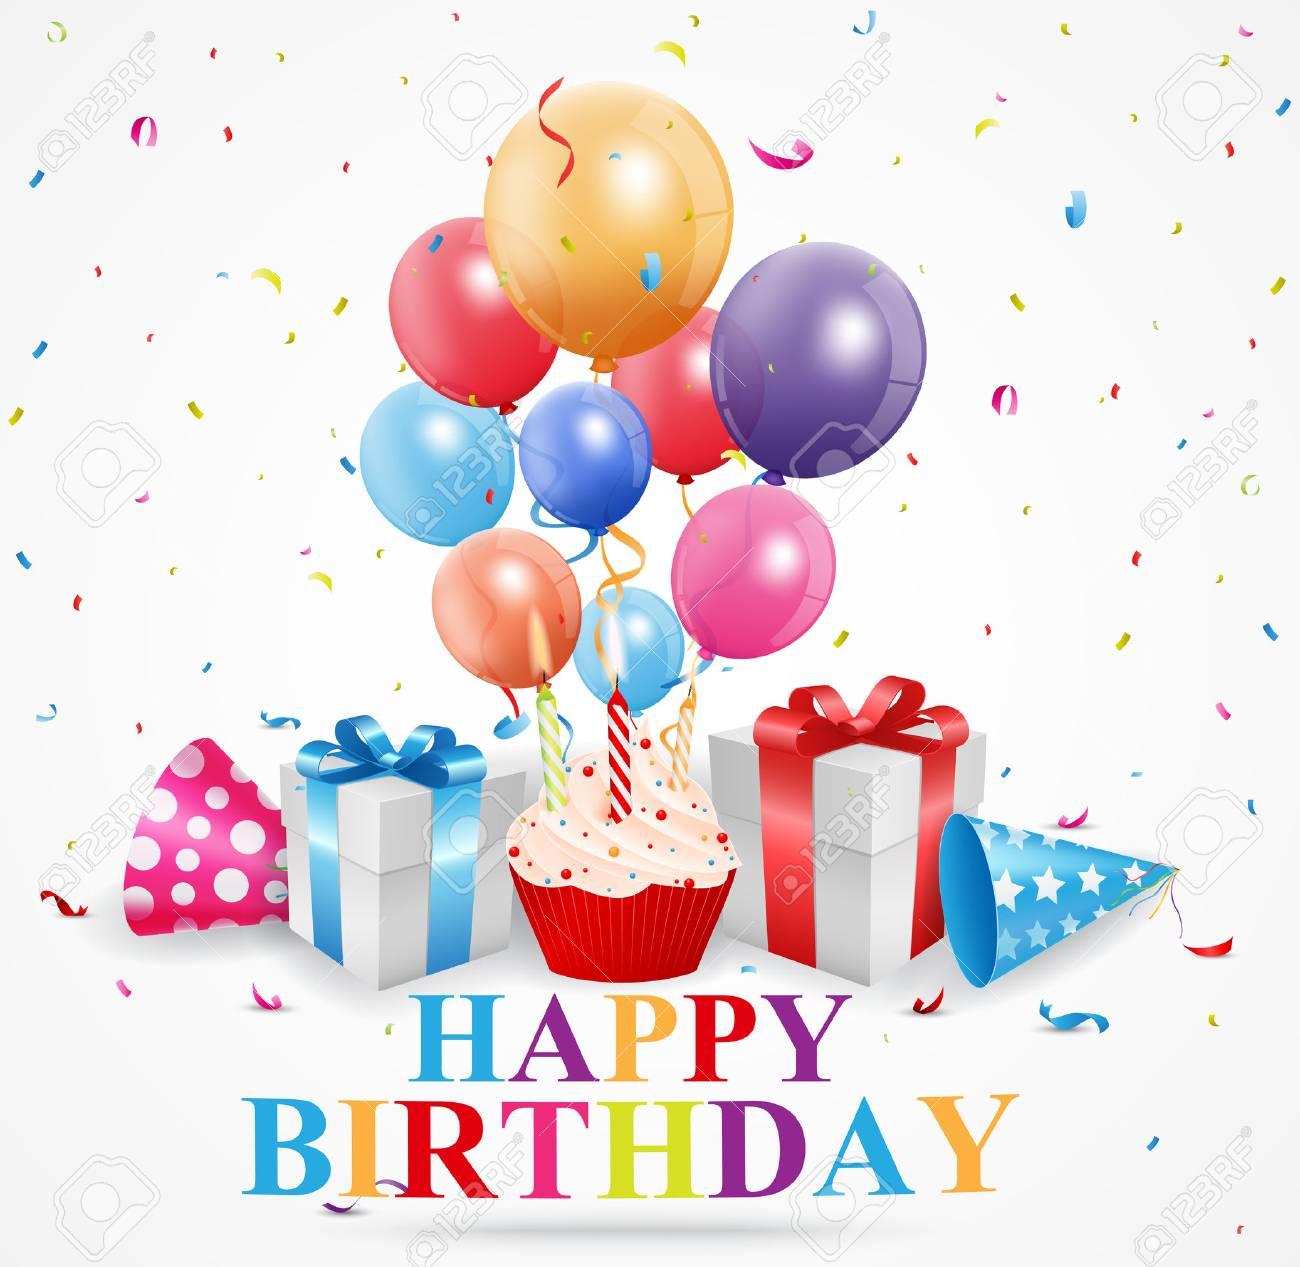 Happy Birthday Greetings Card Stock Vector